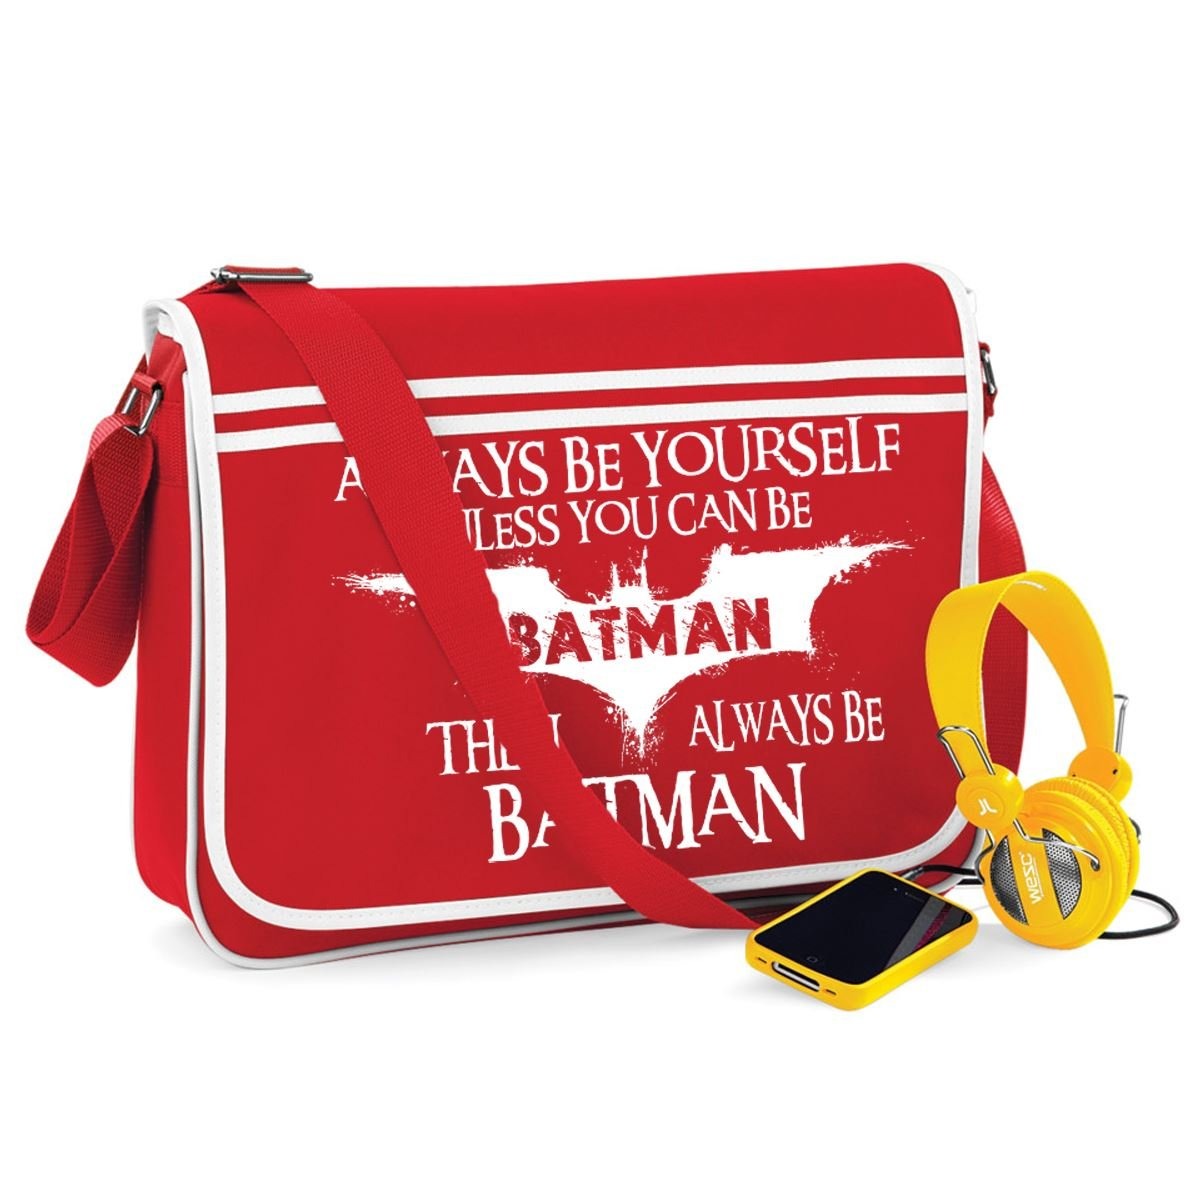 Always Be Batman-Unisex Funny Jokes Sayings Bagbase Retro Messenger Bag StarliteBags